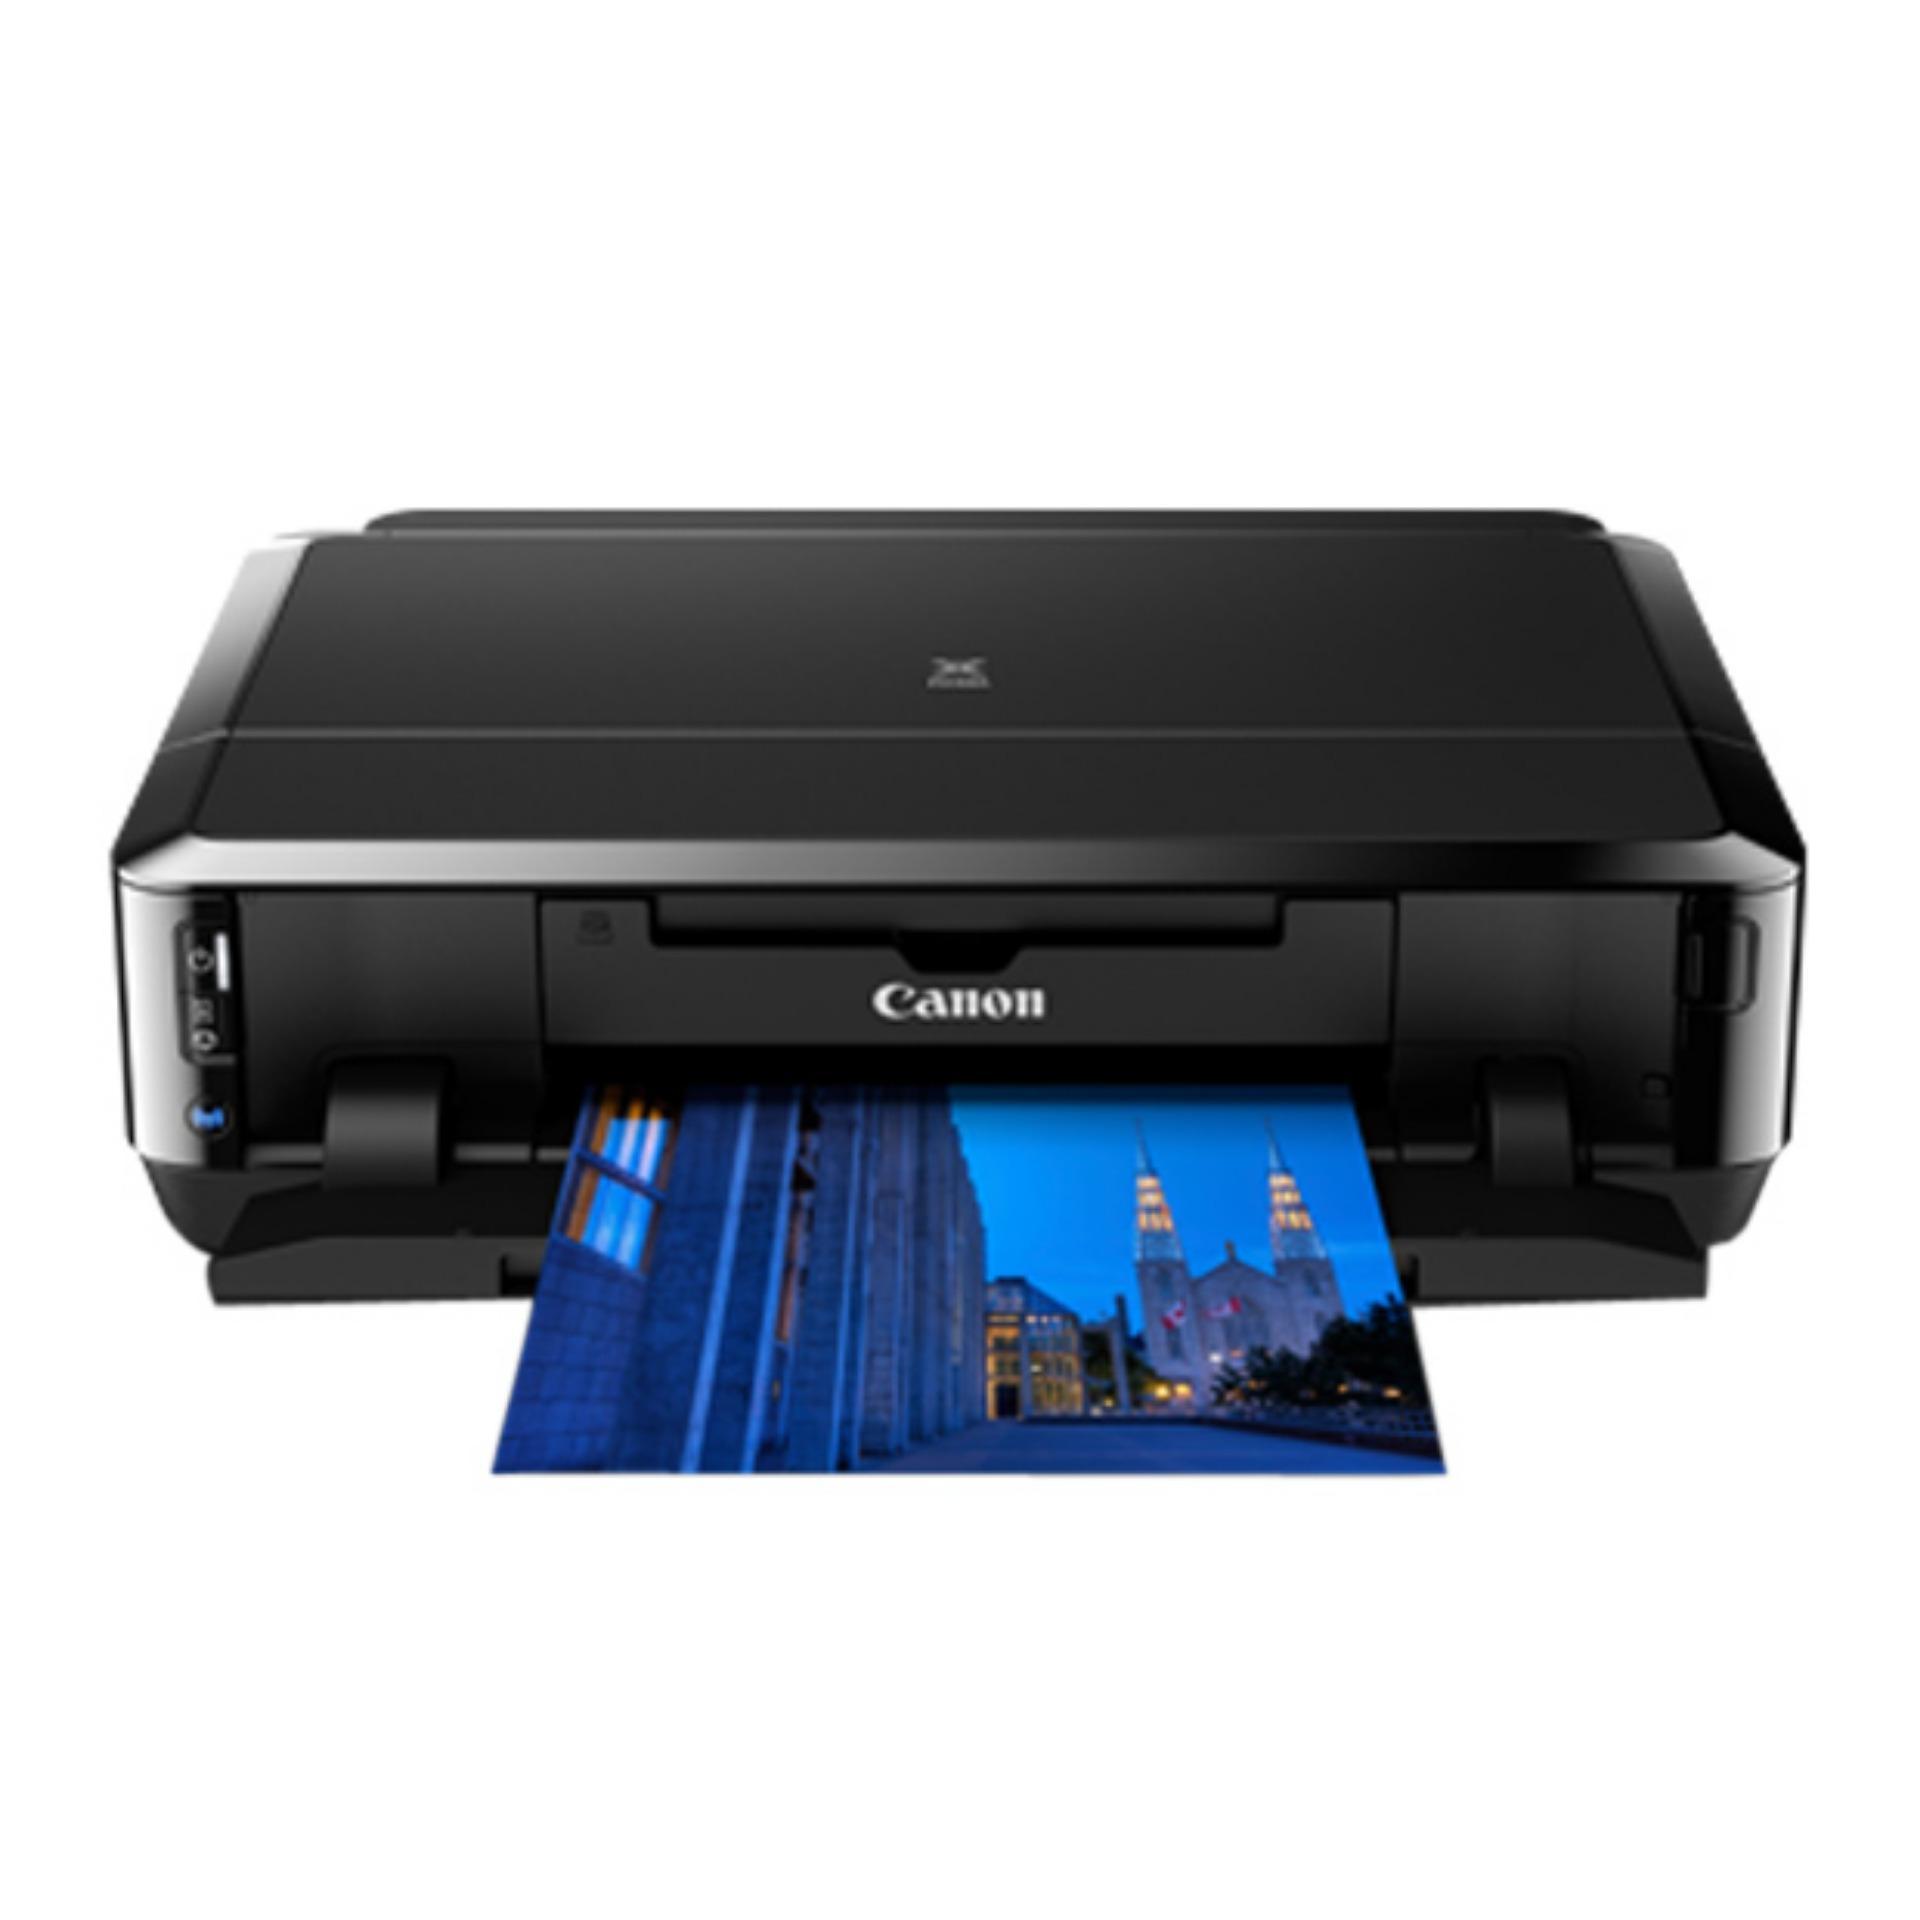 Sun Tinta Hitam Anti Air Printer Canon Black Pigment Waterproofink Super 100ml Pixma Ip7270